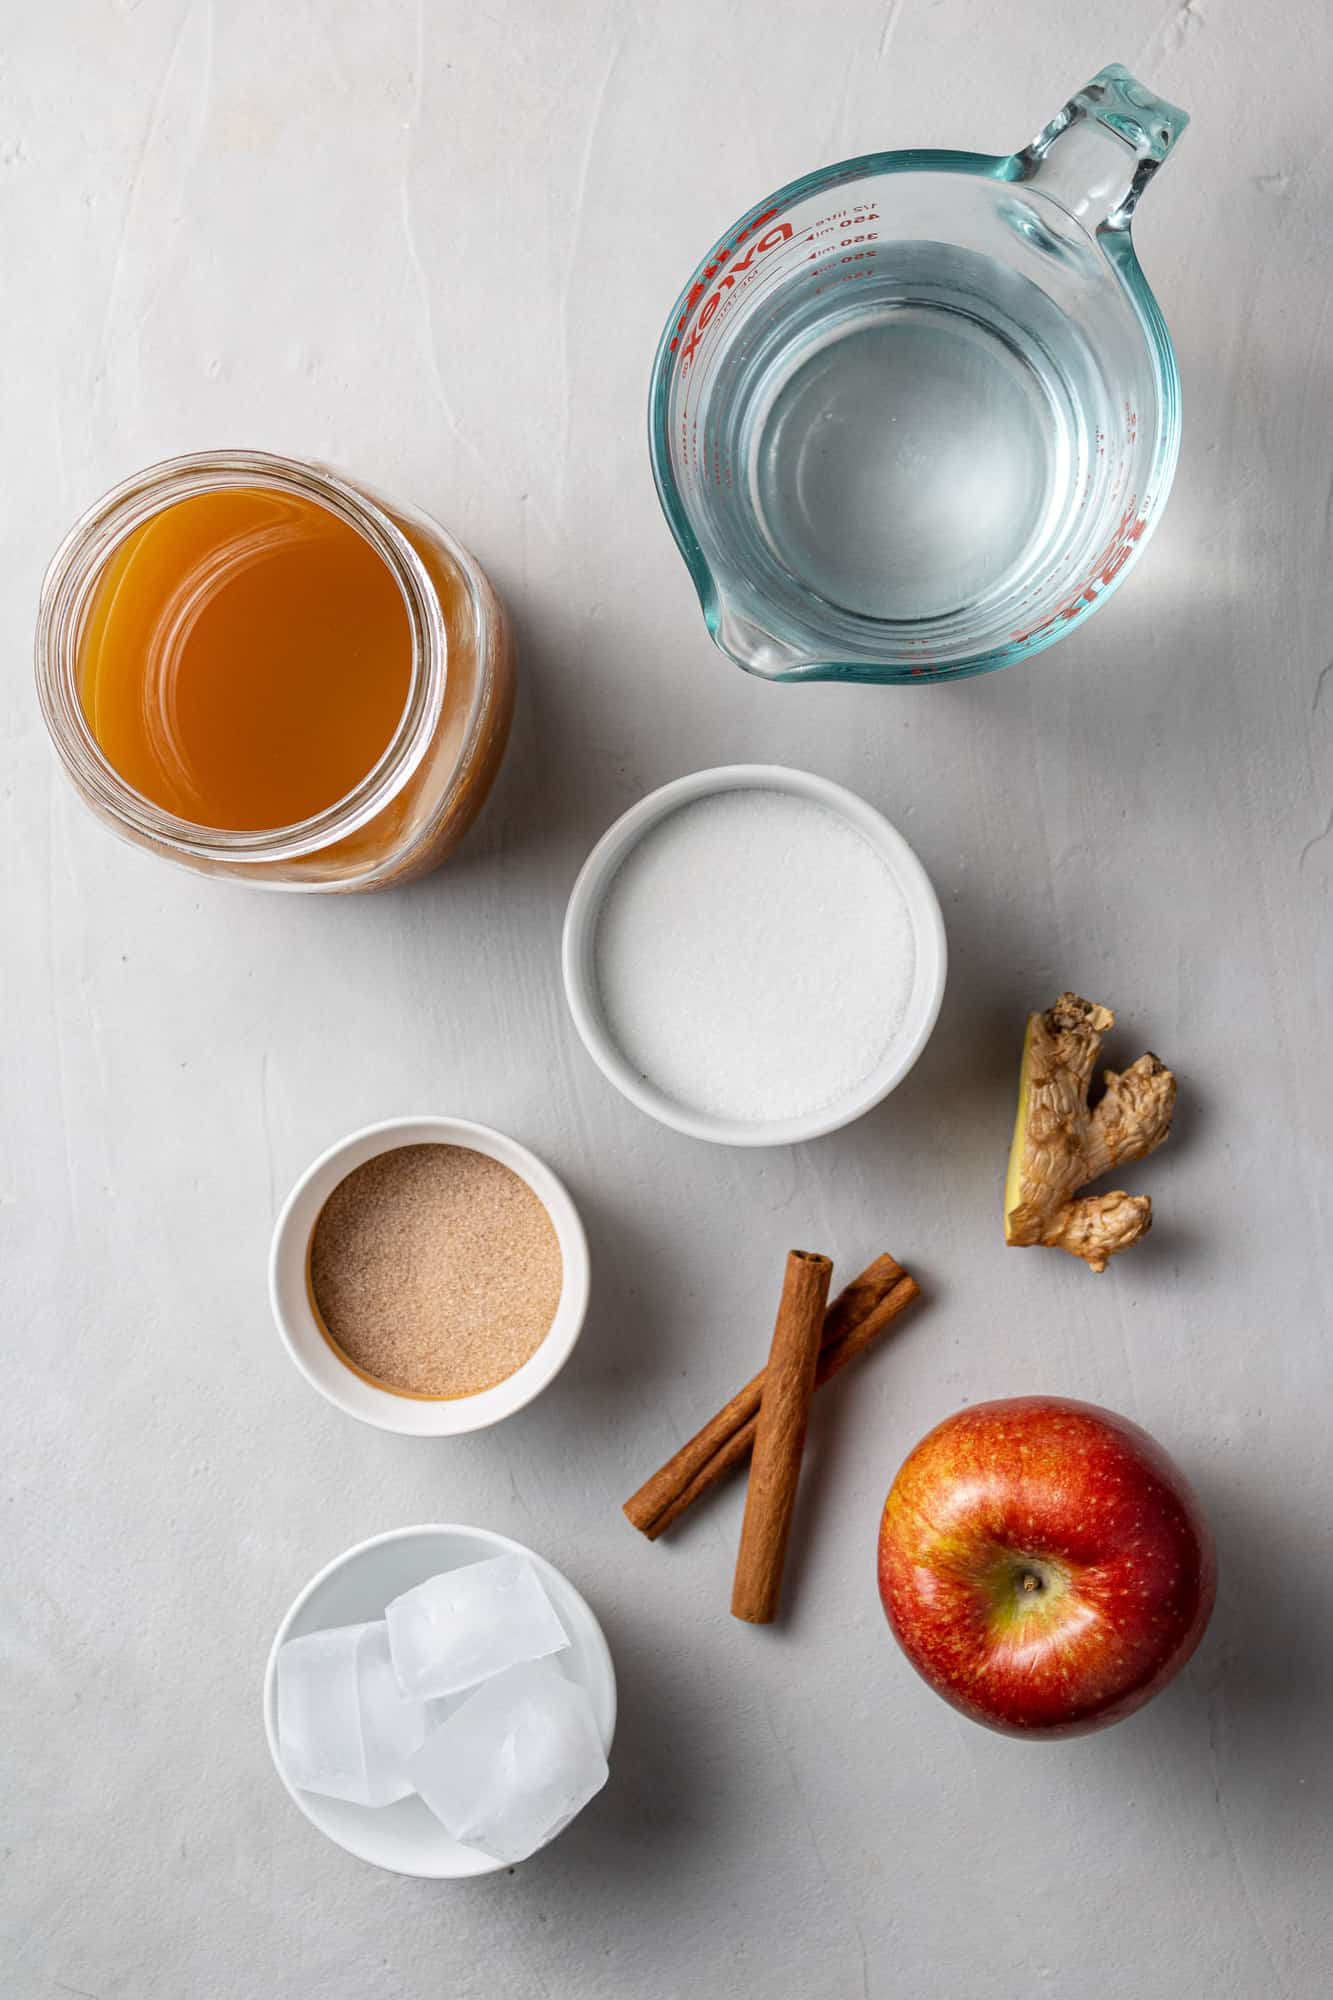 Overhead view of cider, water, cinnamon sticks, ginger, apple, and cinnamon sugar.